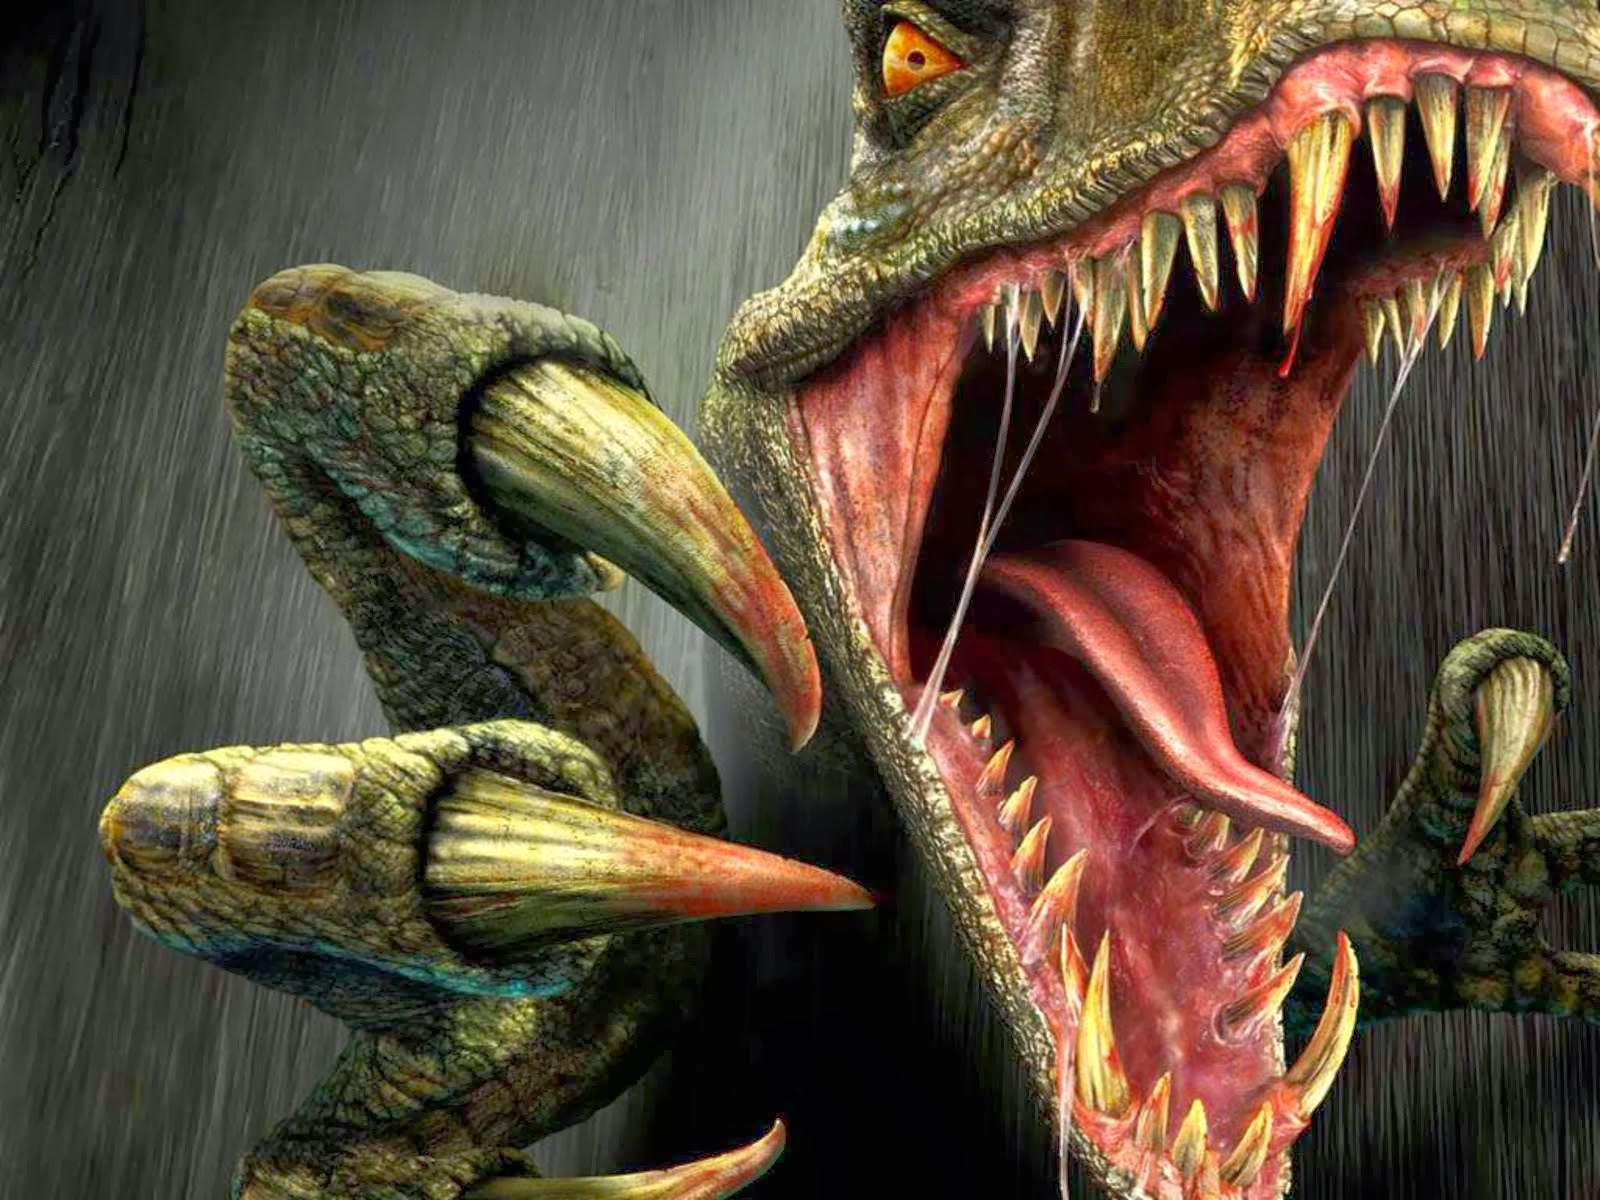 dinosaur latest hd wallpapers 2014 world fresh hd wallapers